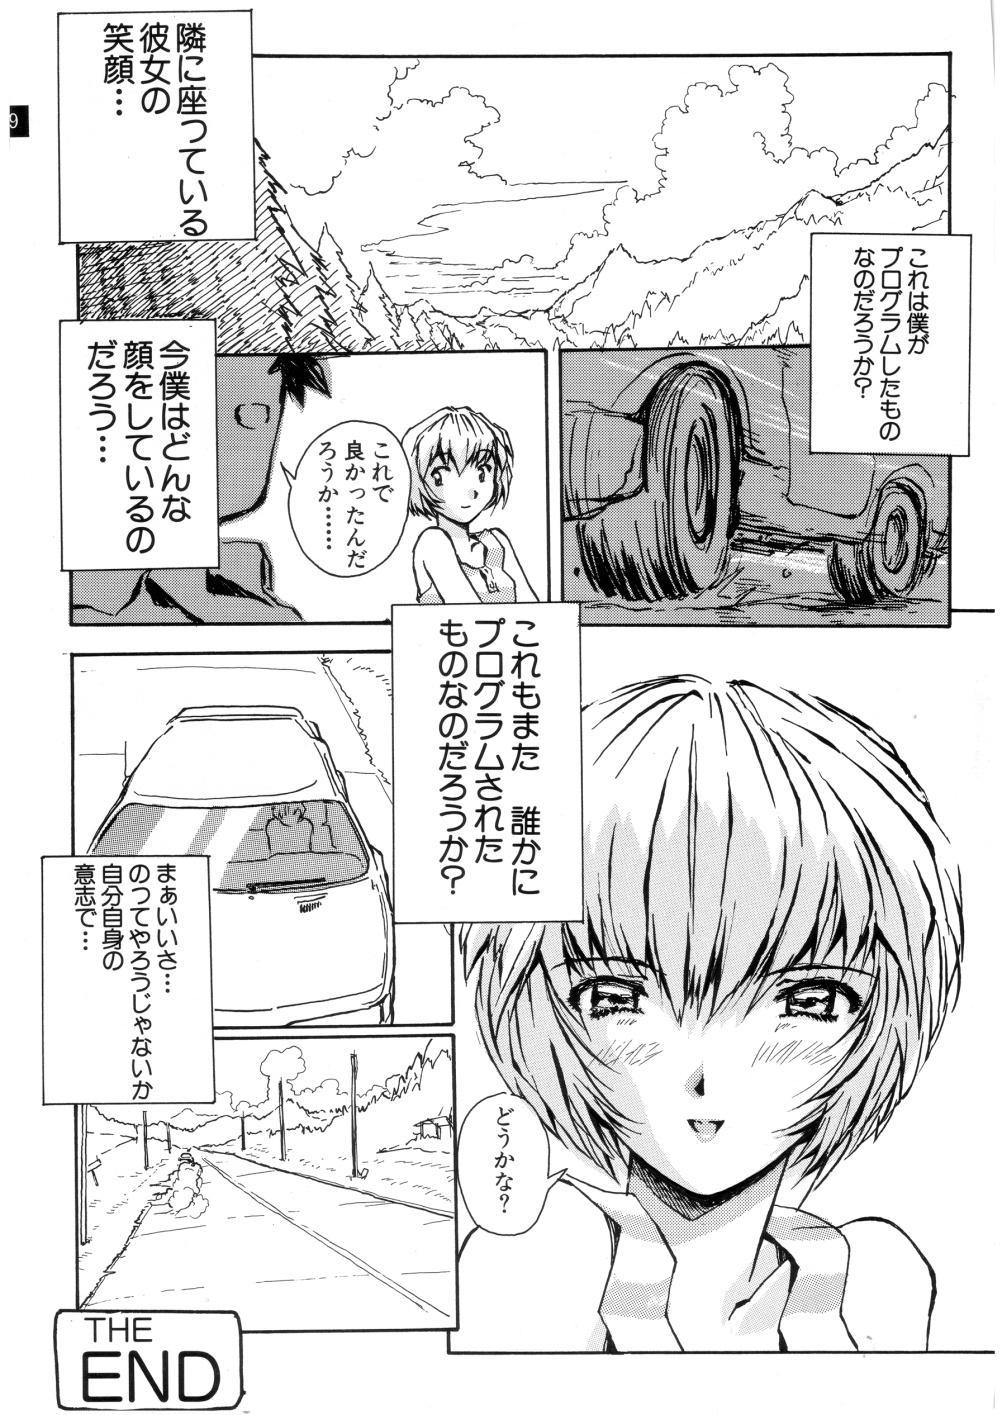 Zense Ki no Evangerikosan 89